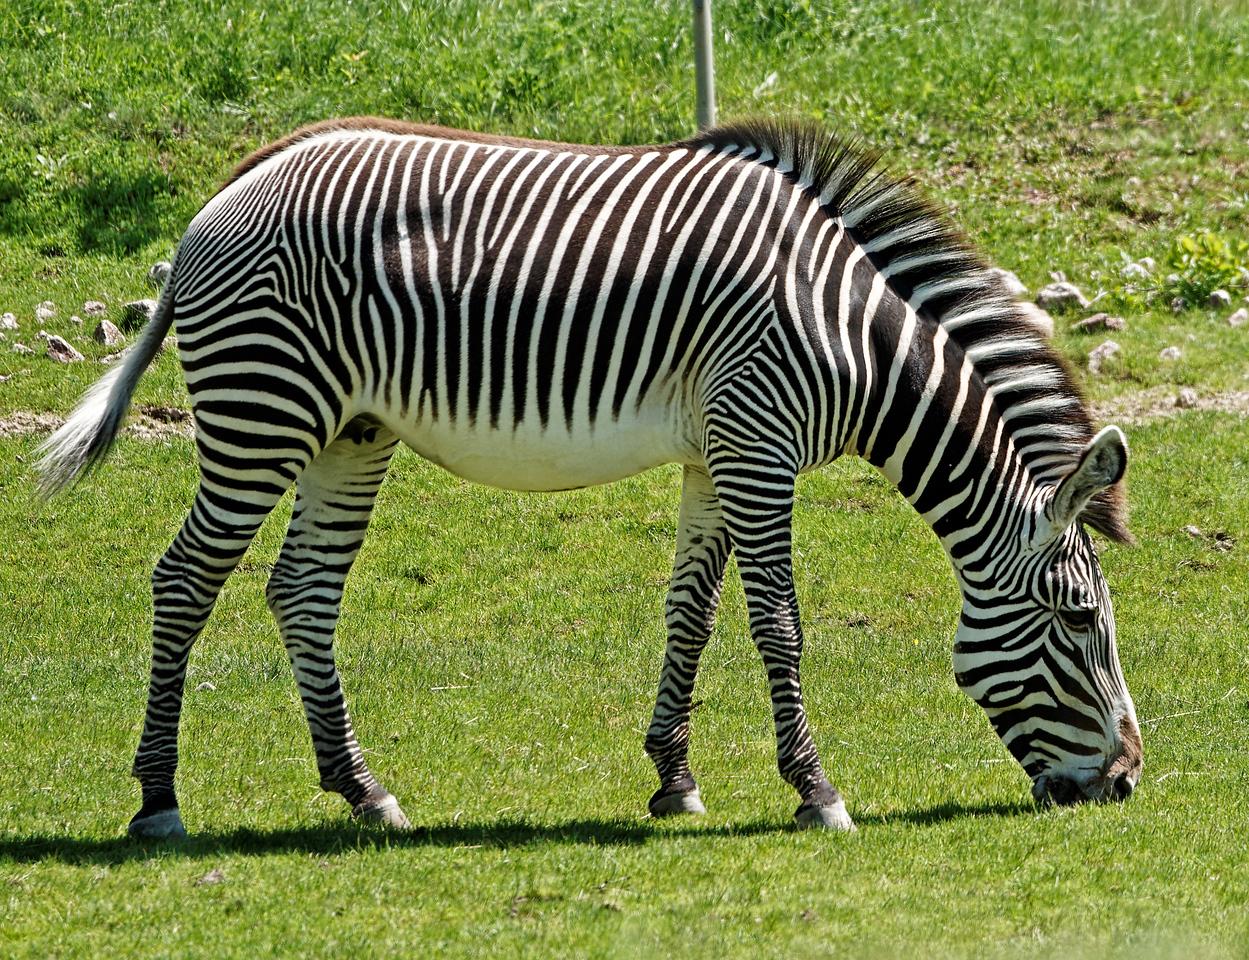 2011-06-02 - Toronto Zoo - 001